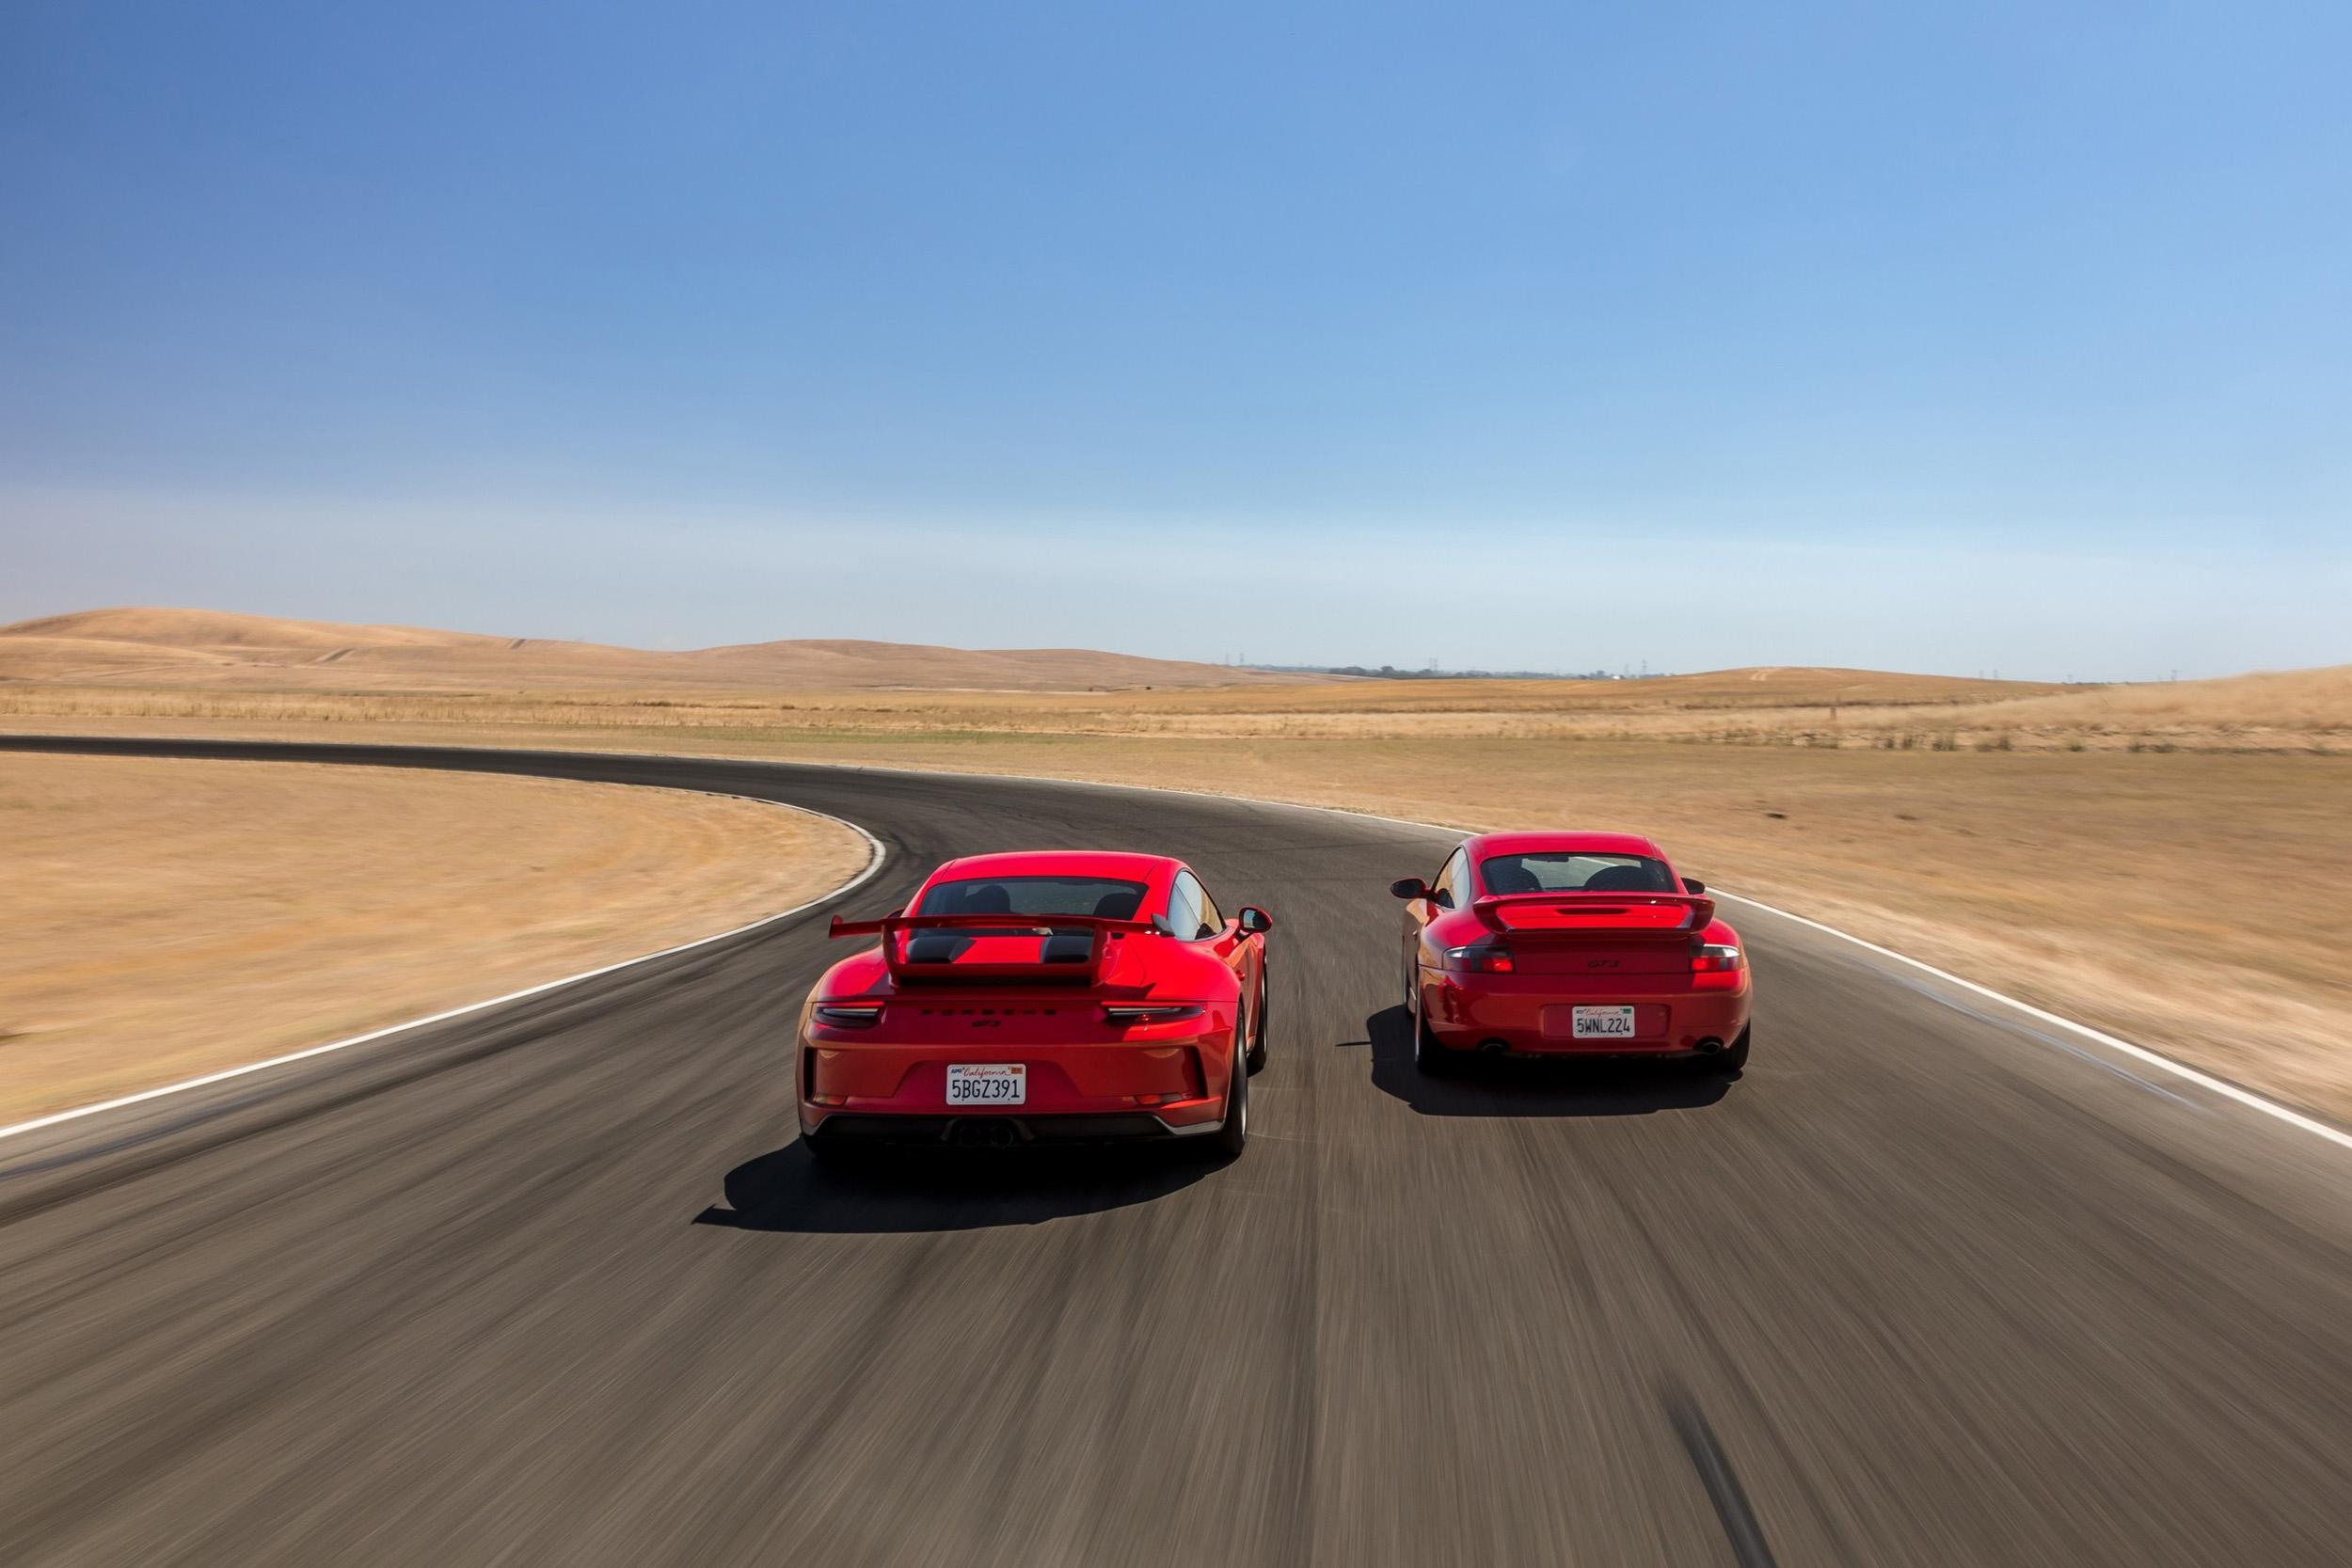 Porsche 911 GTS 2 generations